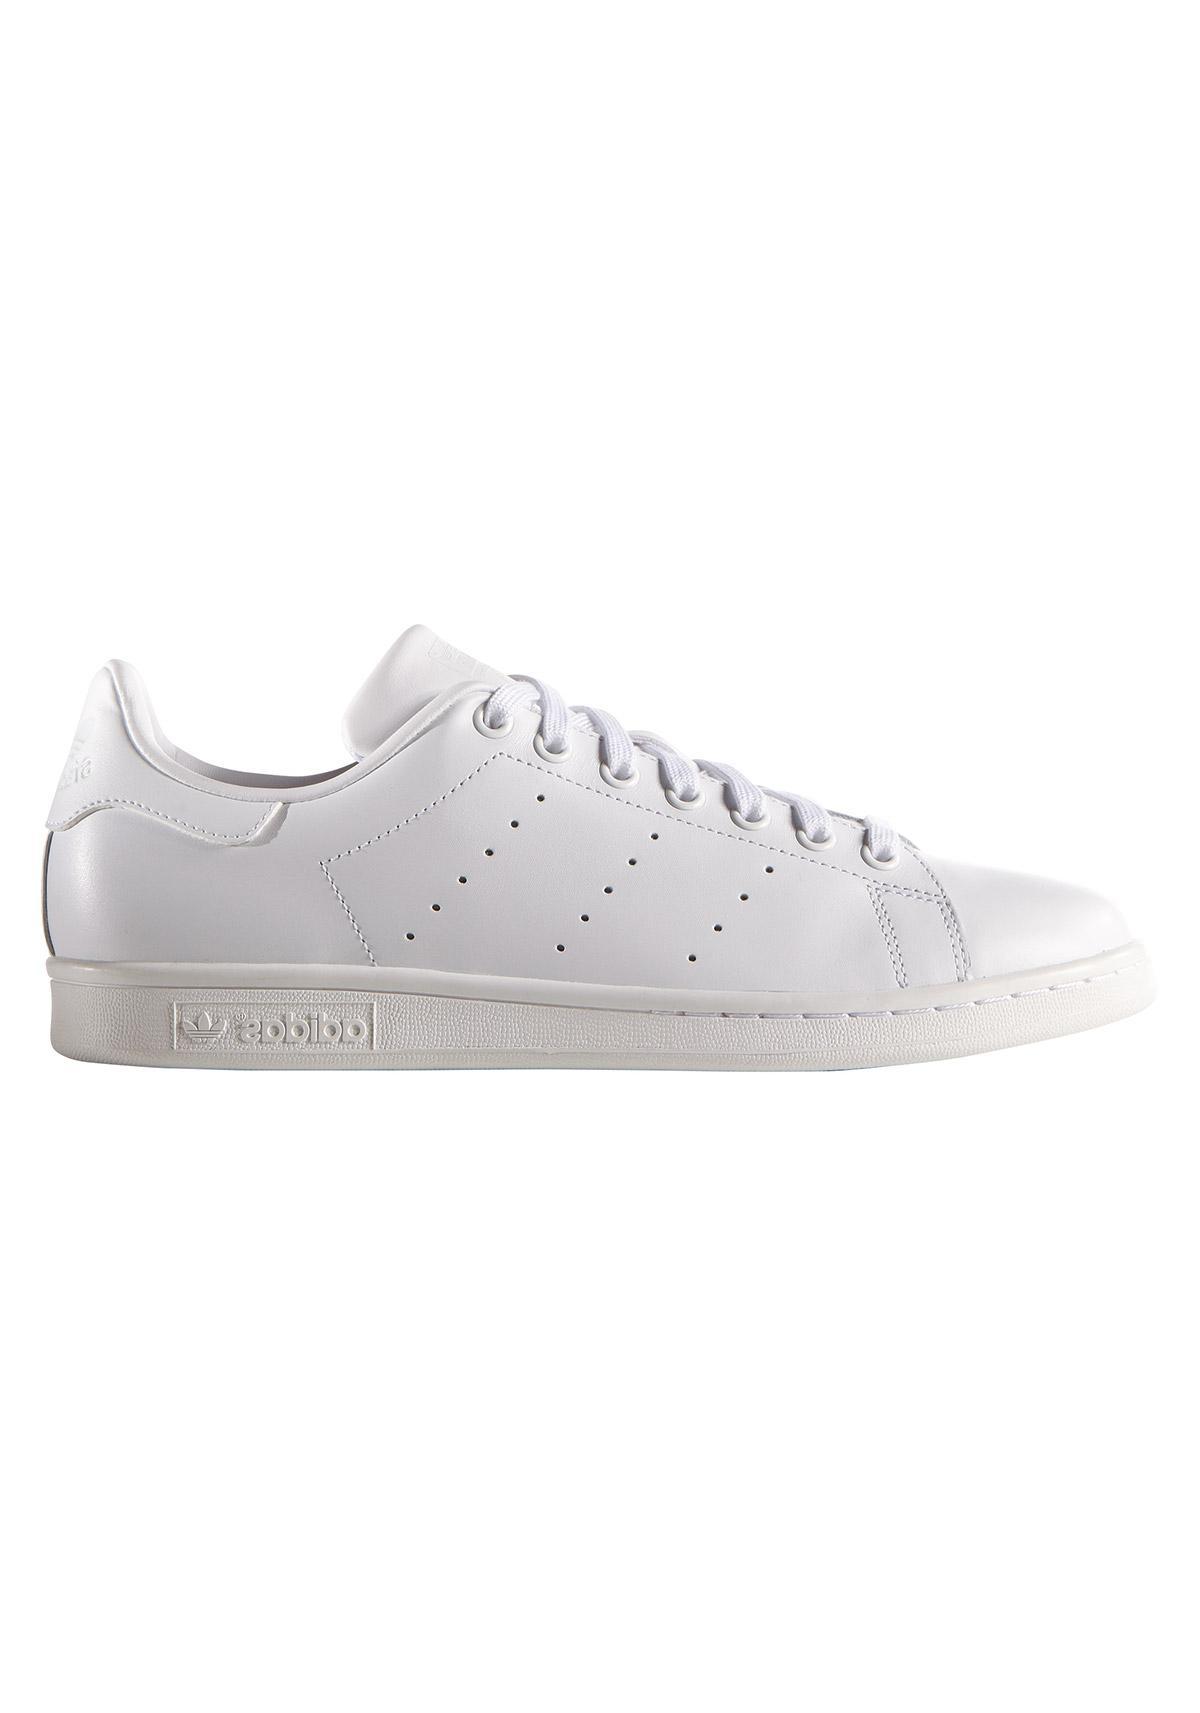 Adidas WSchuh FarbeWeiss 23 Smith Größe40 Stan XkOP8wnN0